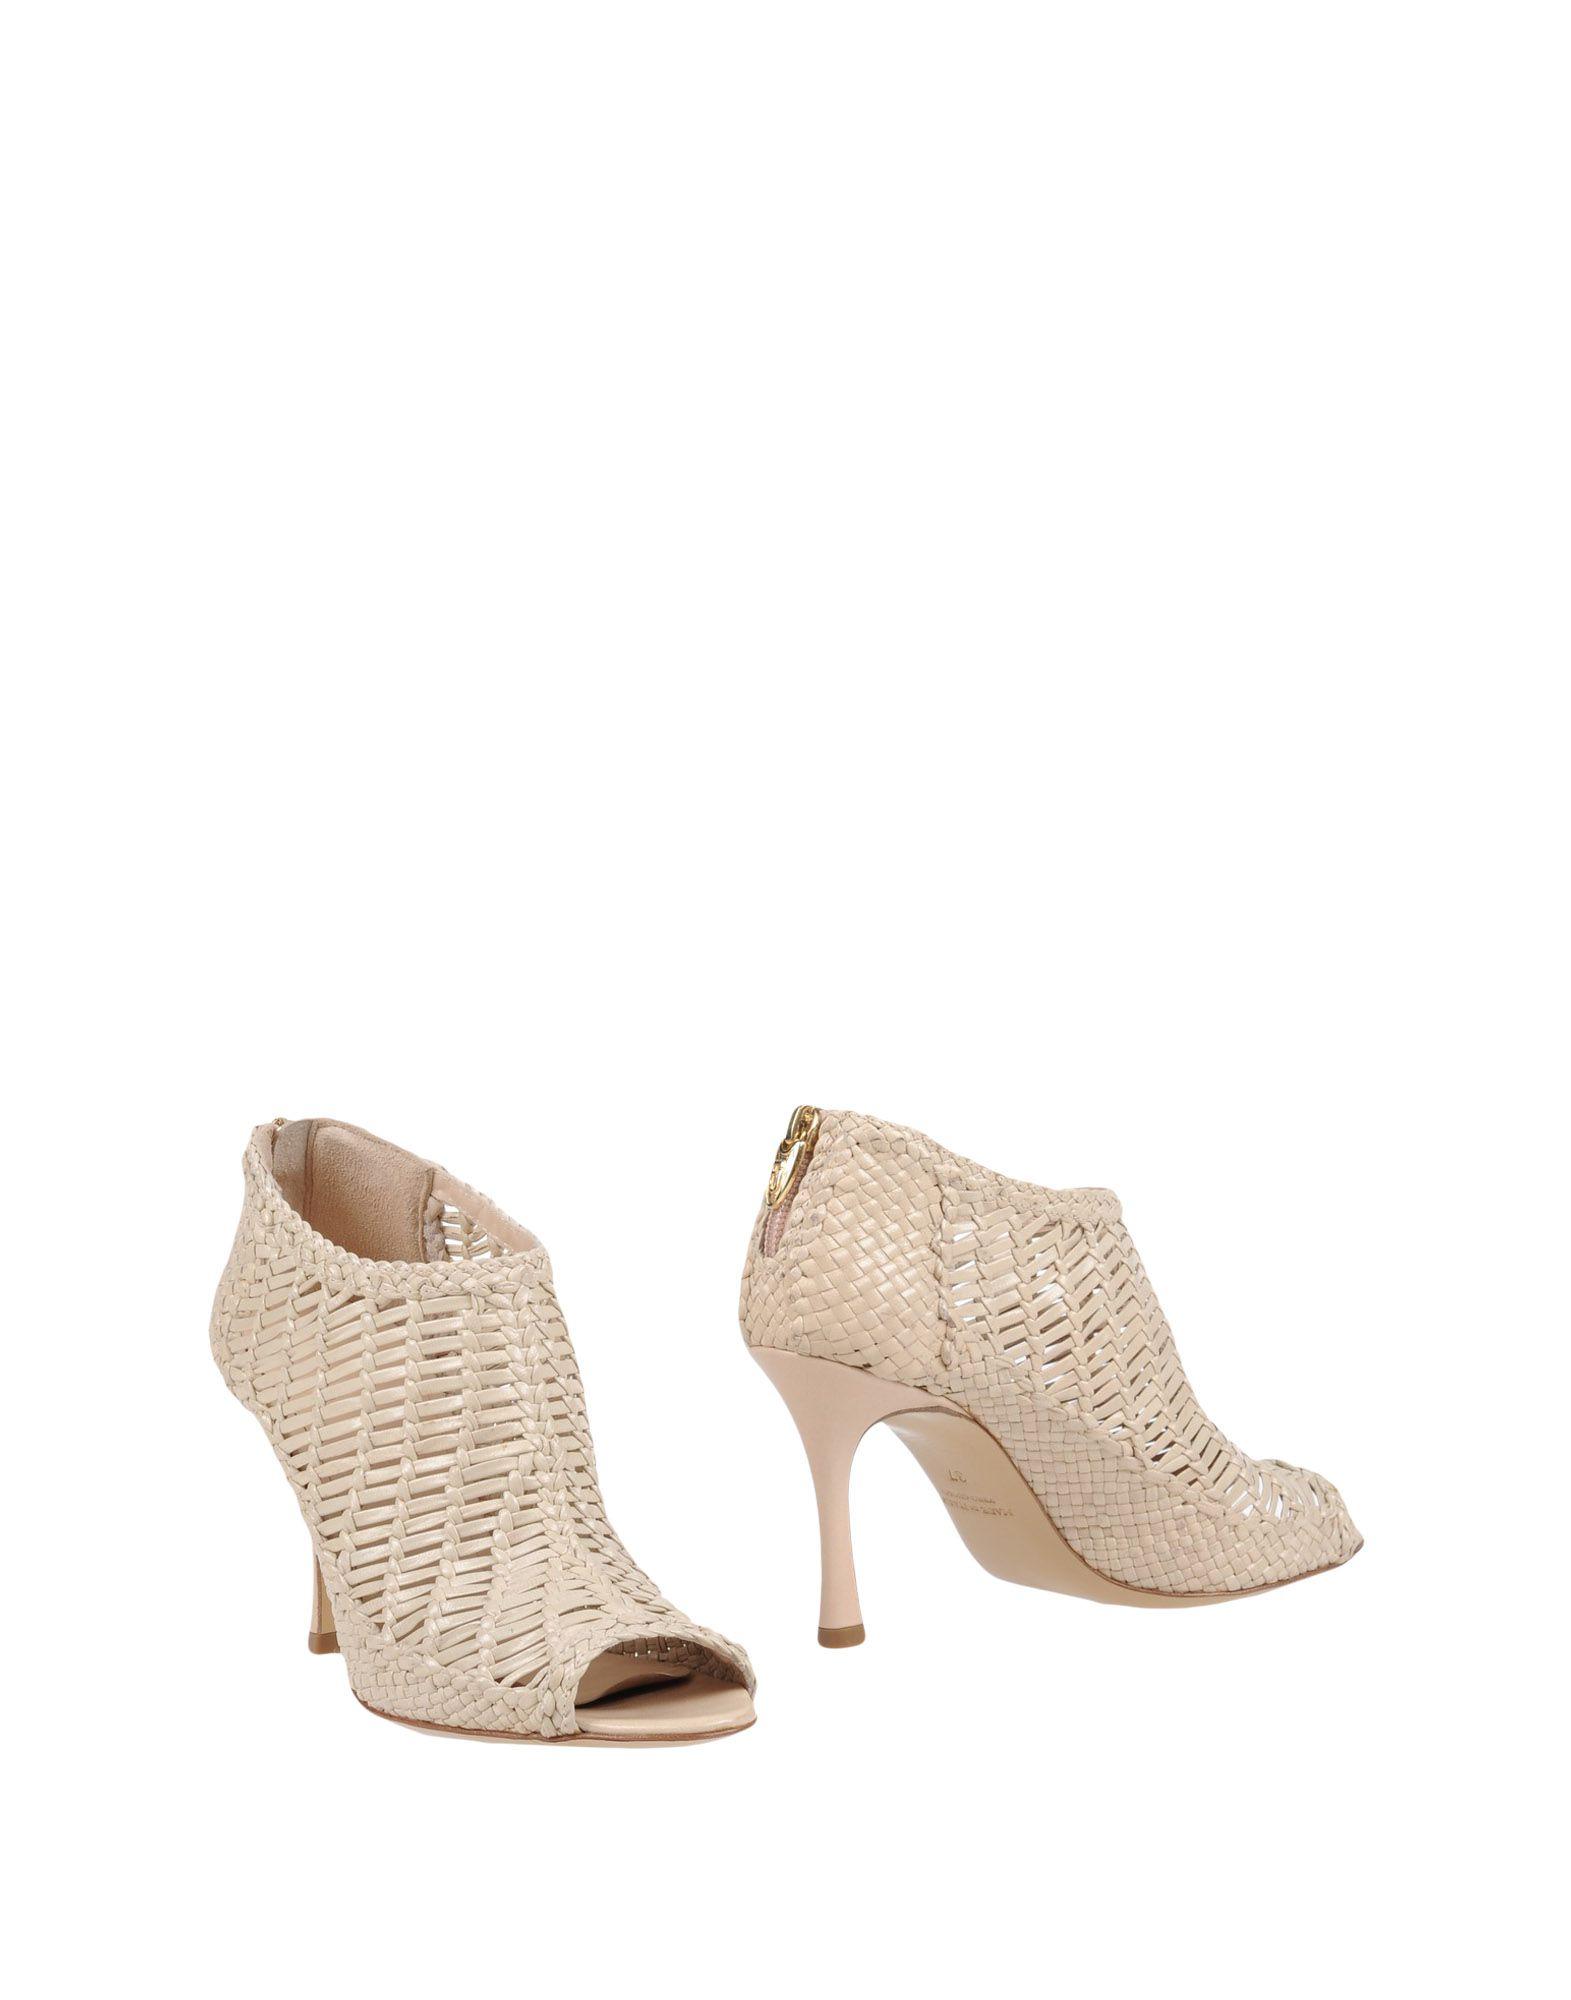 Gut um 11438589KV billige Schuhe zu tragenFauzian Jeunesse Stiefelette Damen  11438589KV um e1cbeb